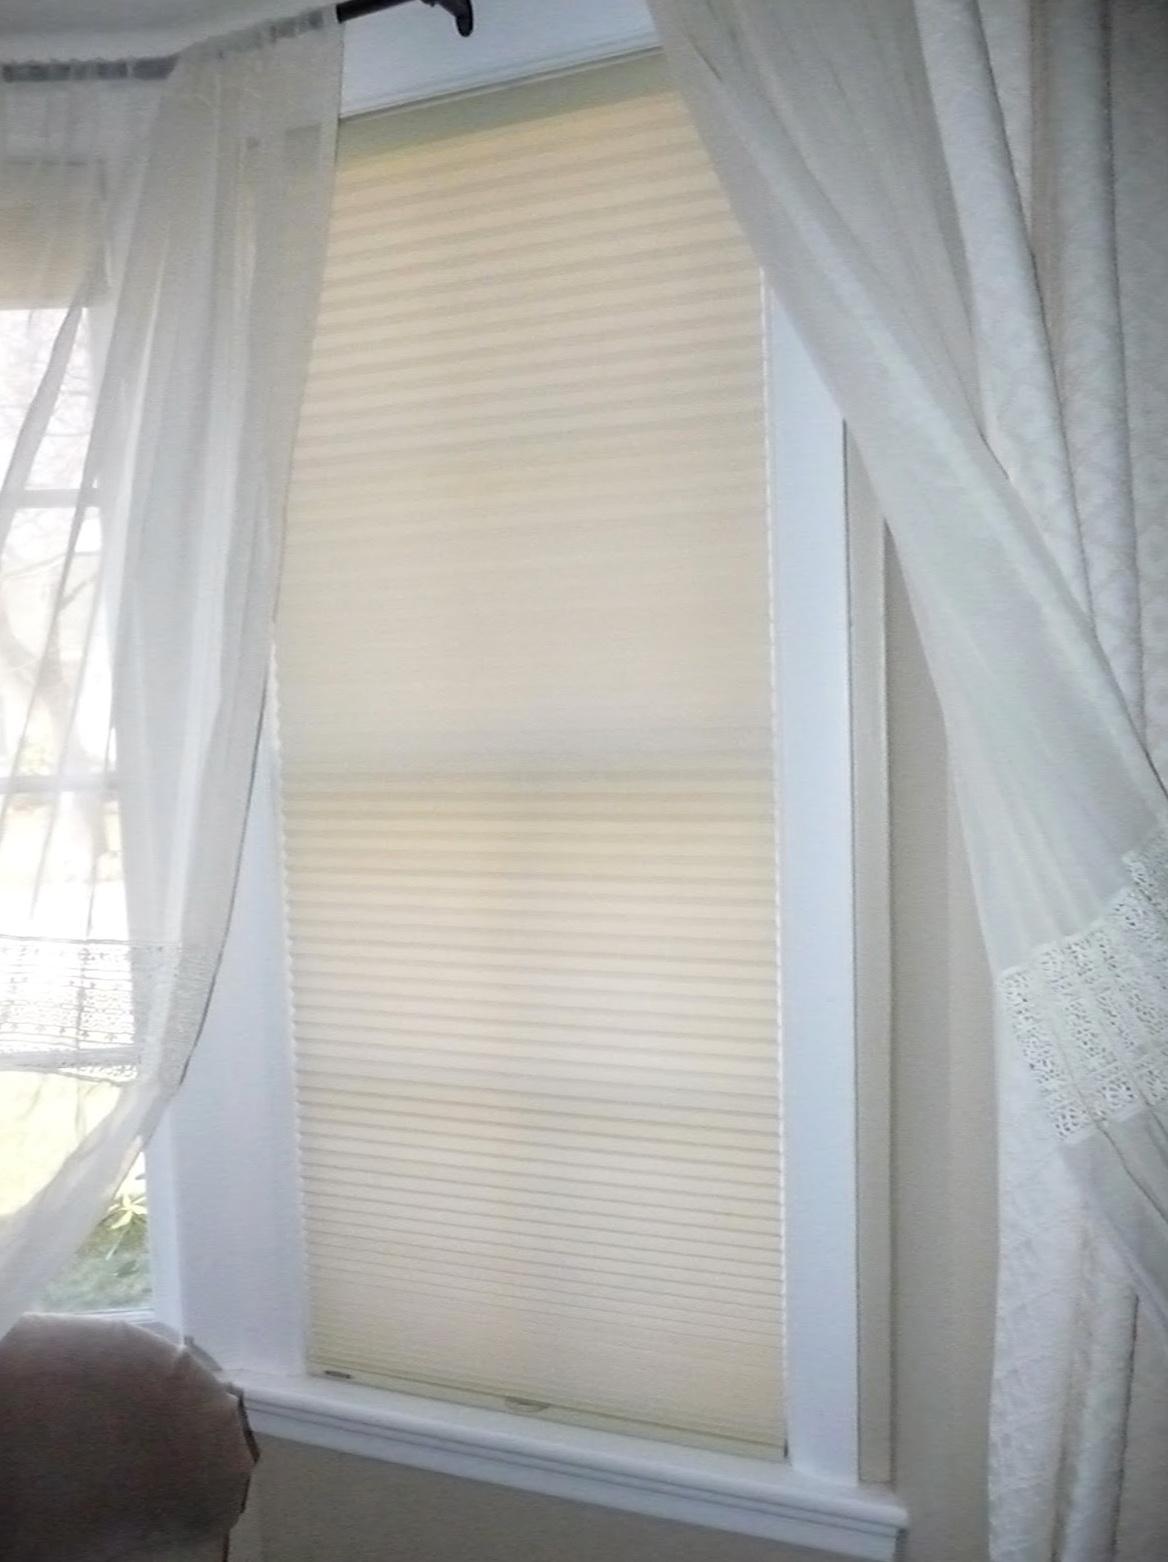 Sheer Curtains Inside Window Frame Home Design Ideas